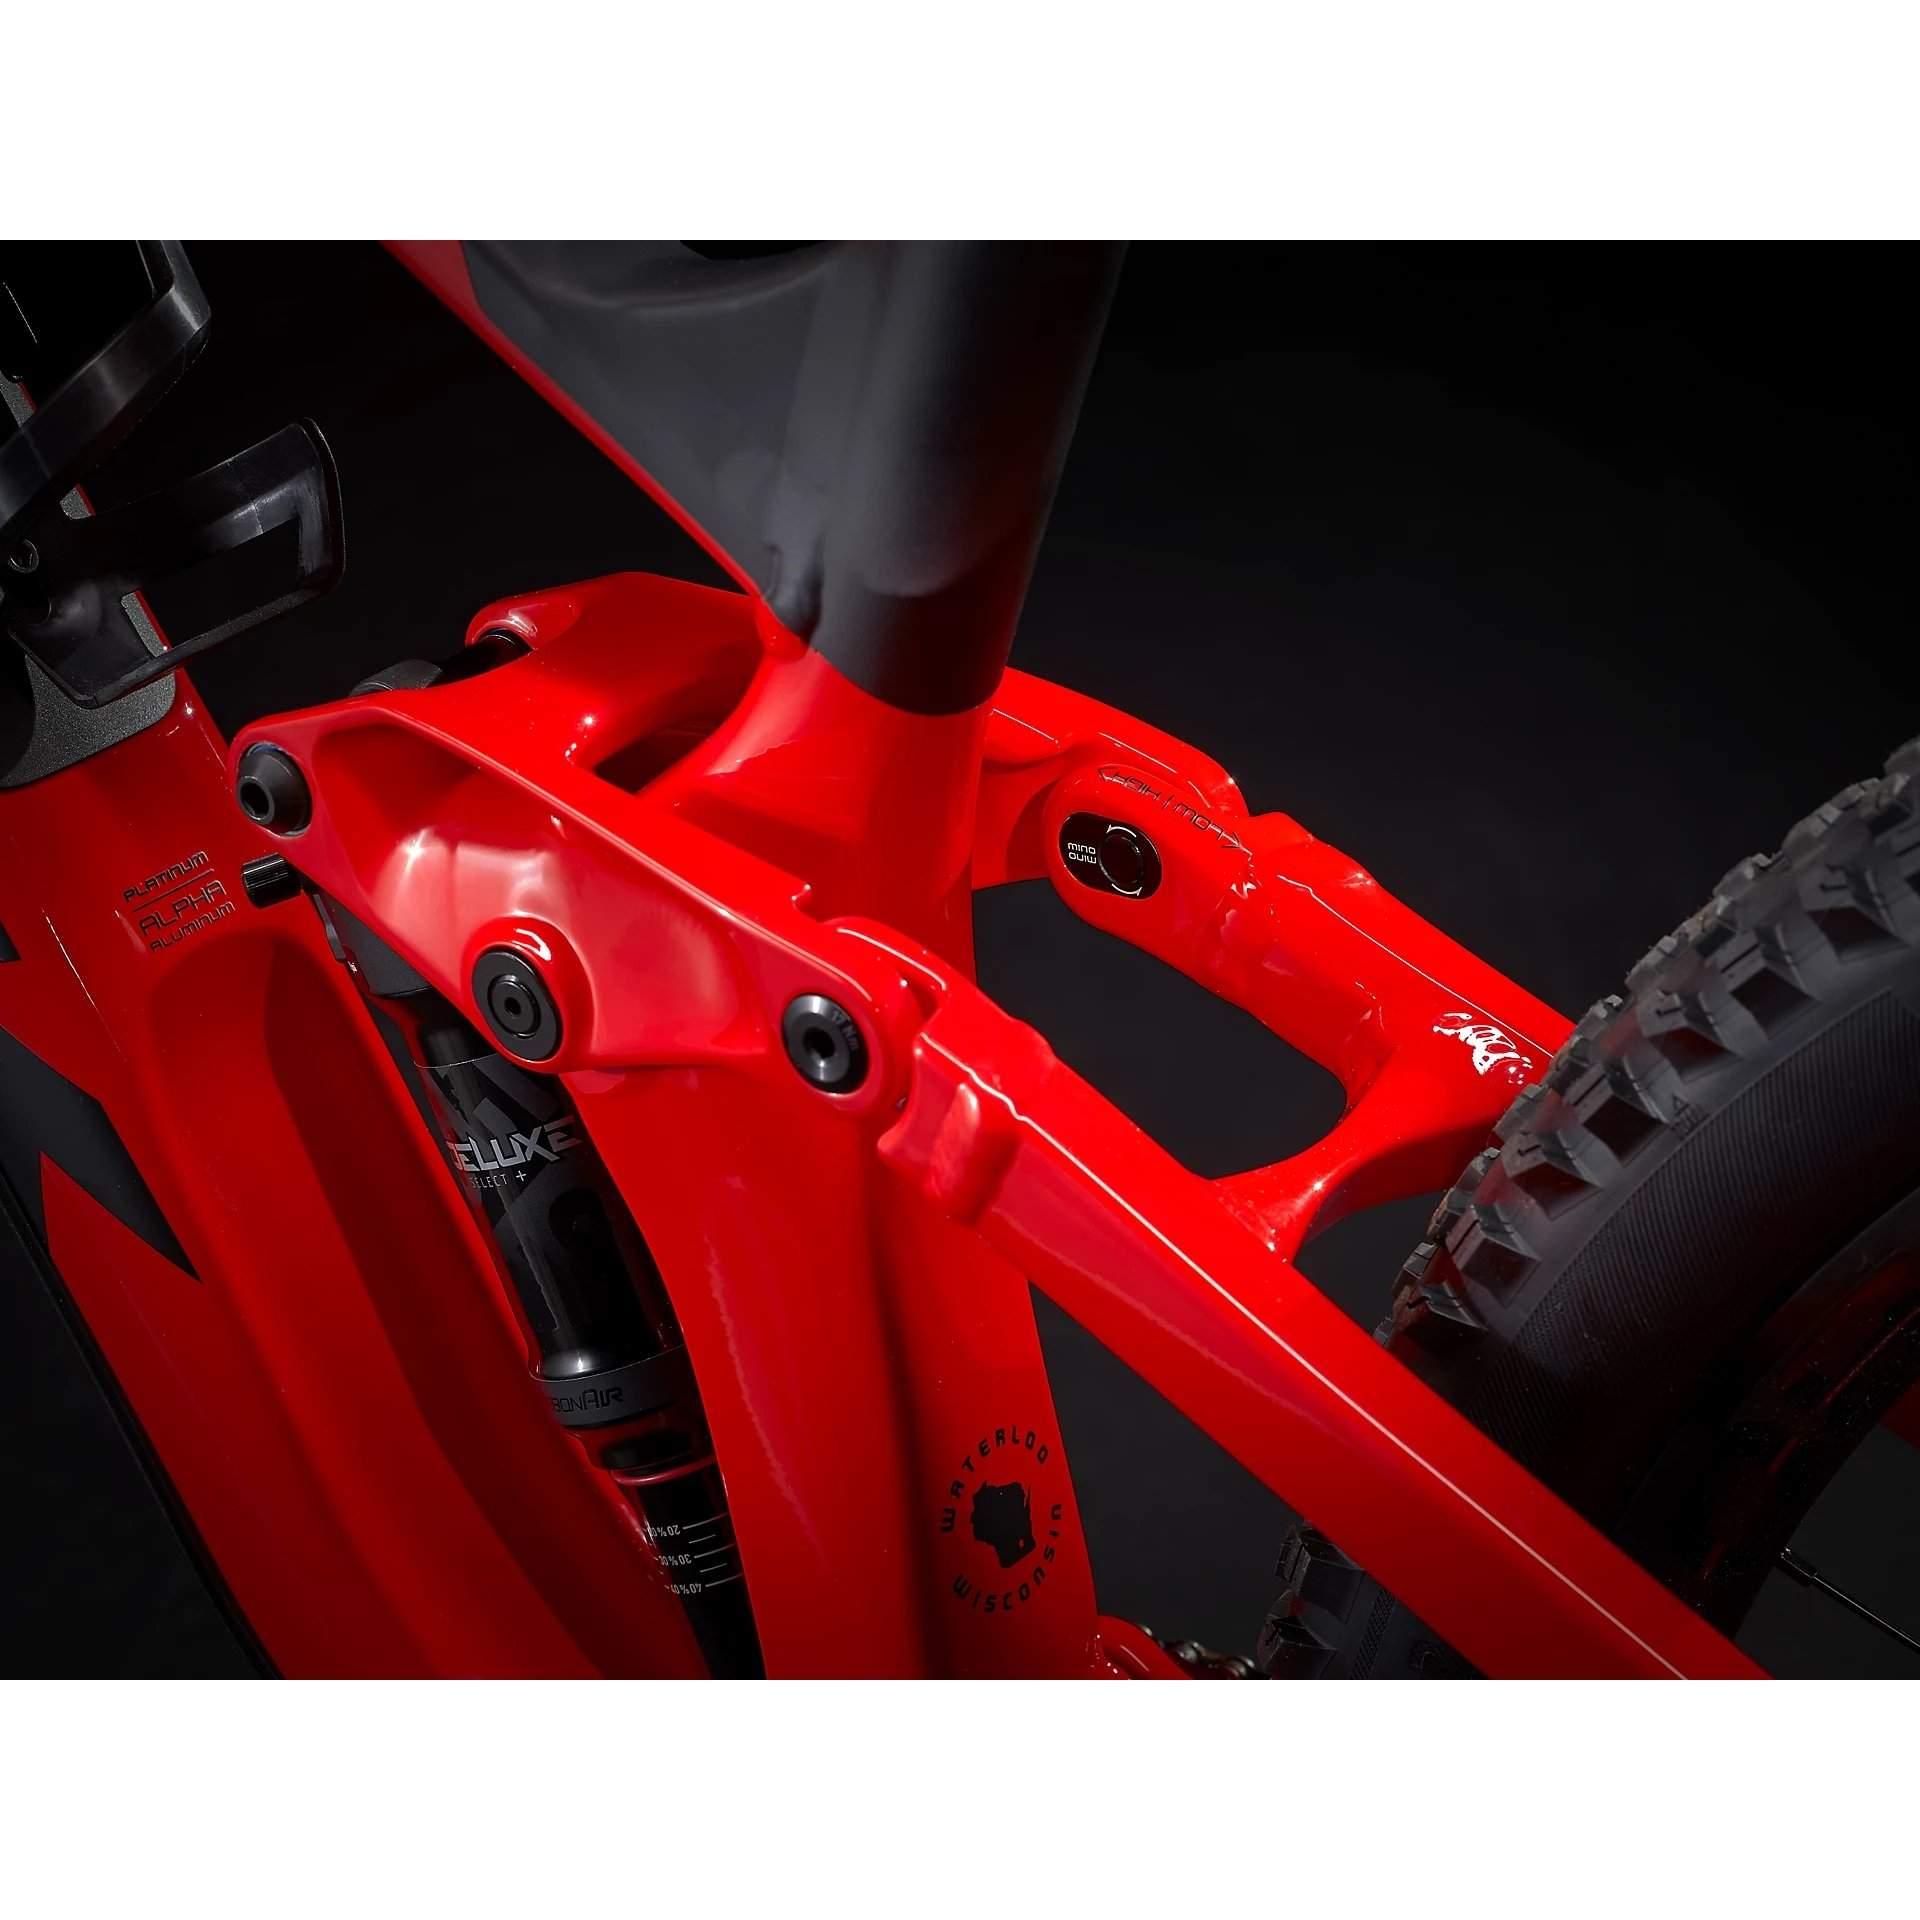 ROWER TREK SLASH 7 GLOSS RADIOACTIVE RED|MATTE BLACK 9